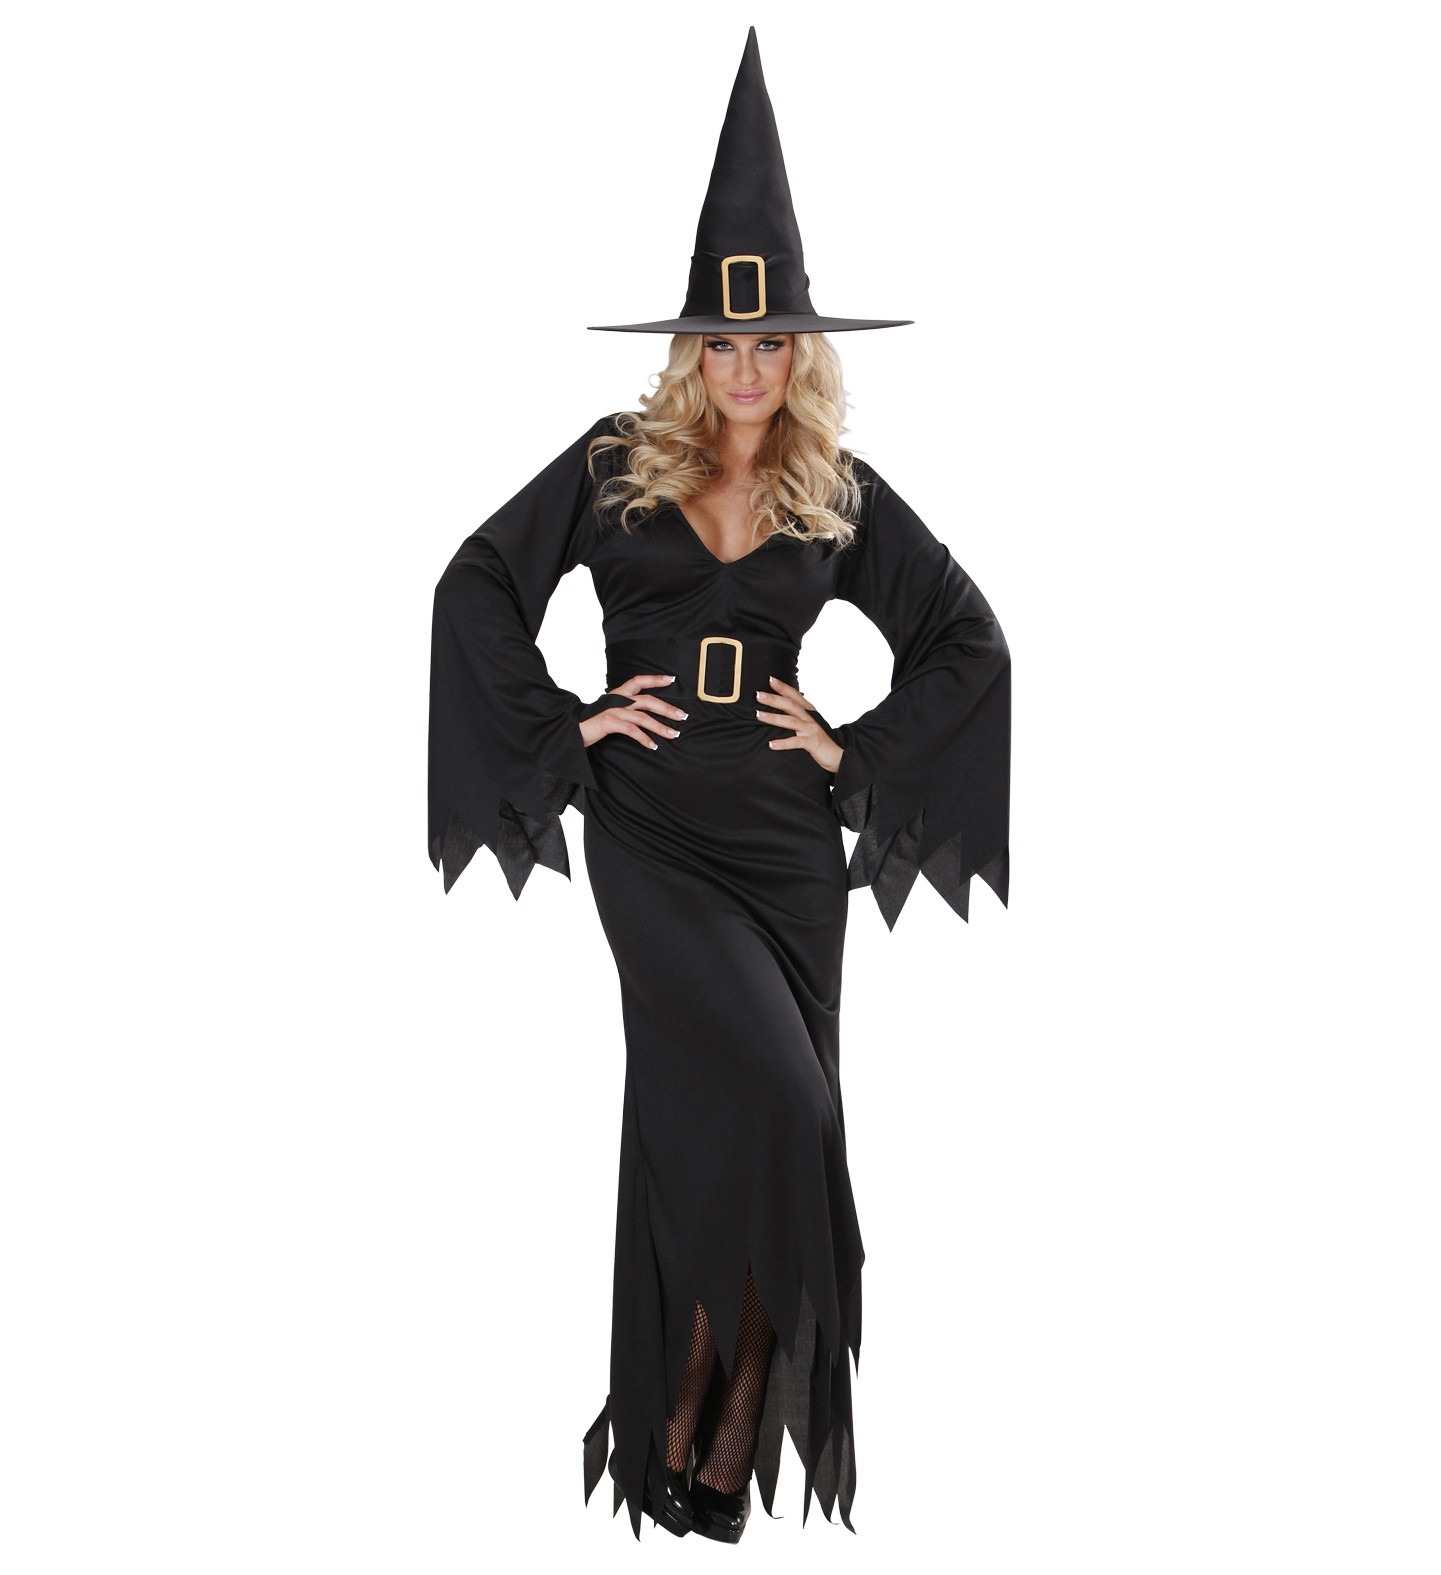 Vestiti Eleganti Halloween.Costume Halloween Donna Vestito Strega Elegante Ps 21848